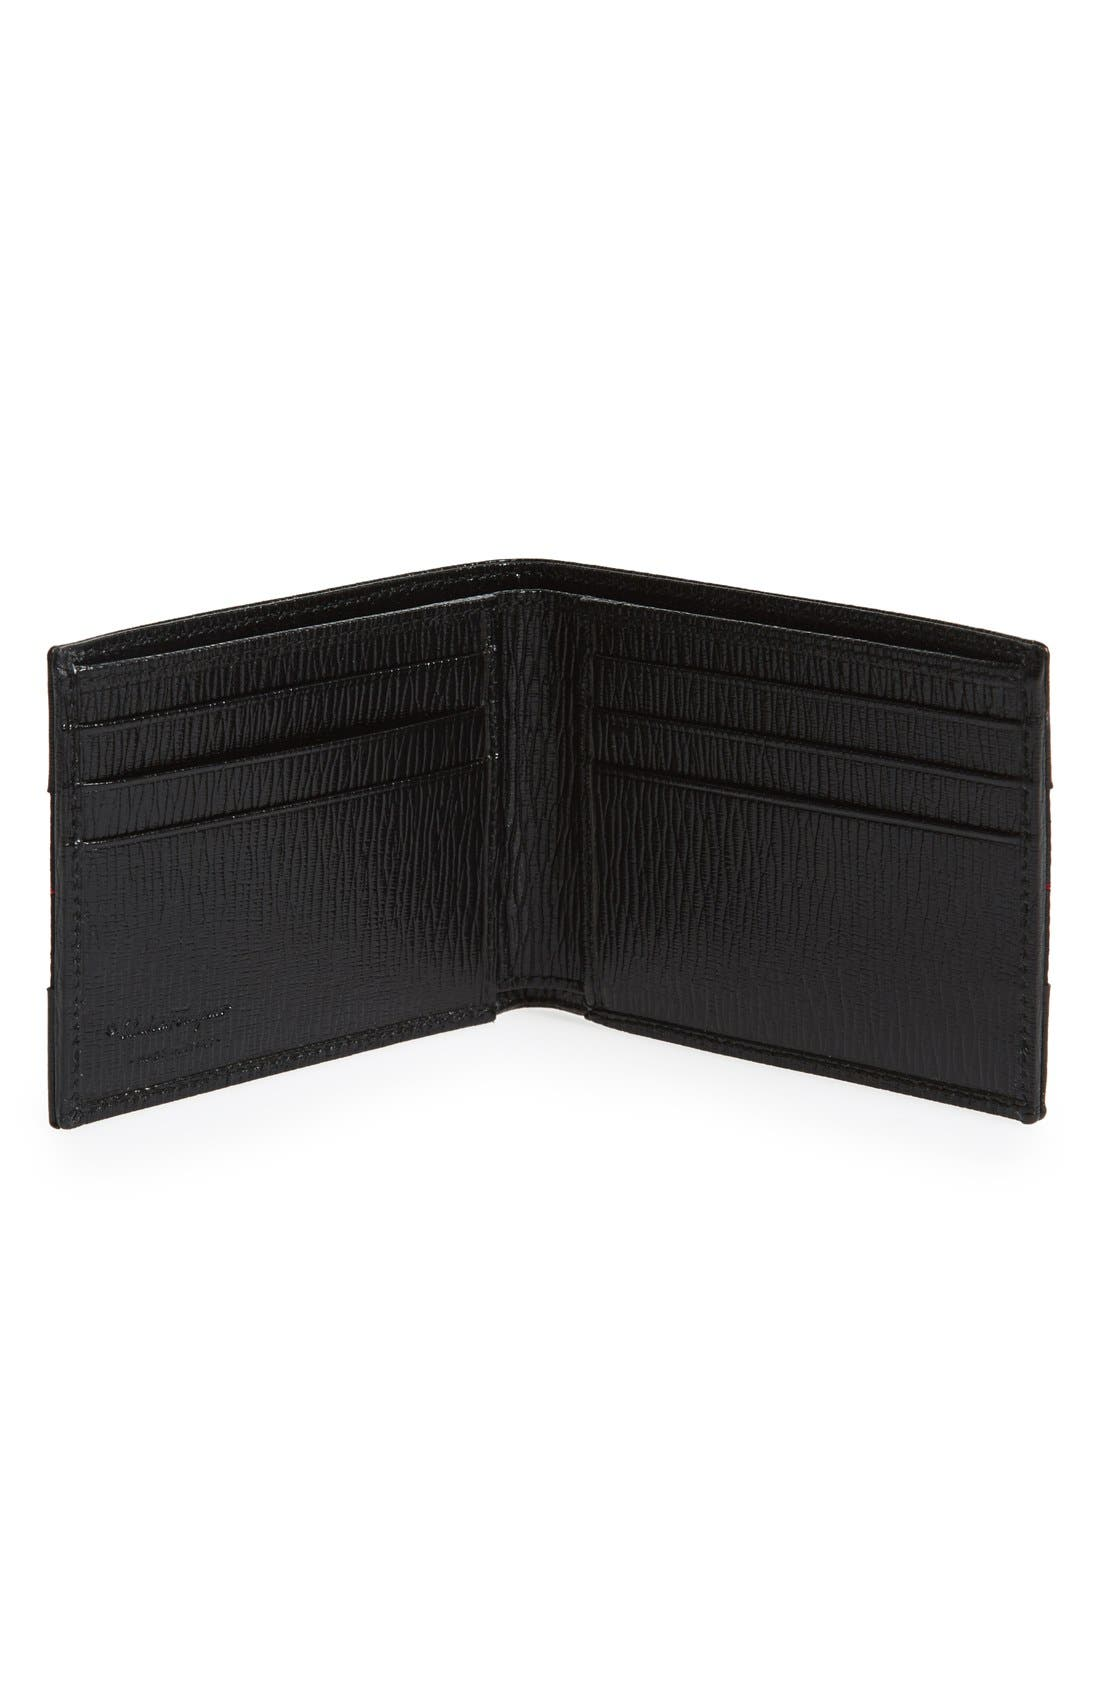 Alternate Image 2  - Salvatore Ferragamo 'Revival' Wallet